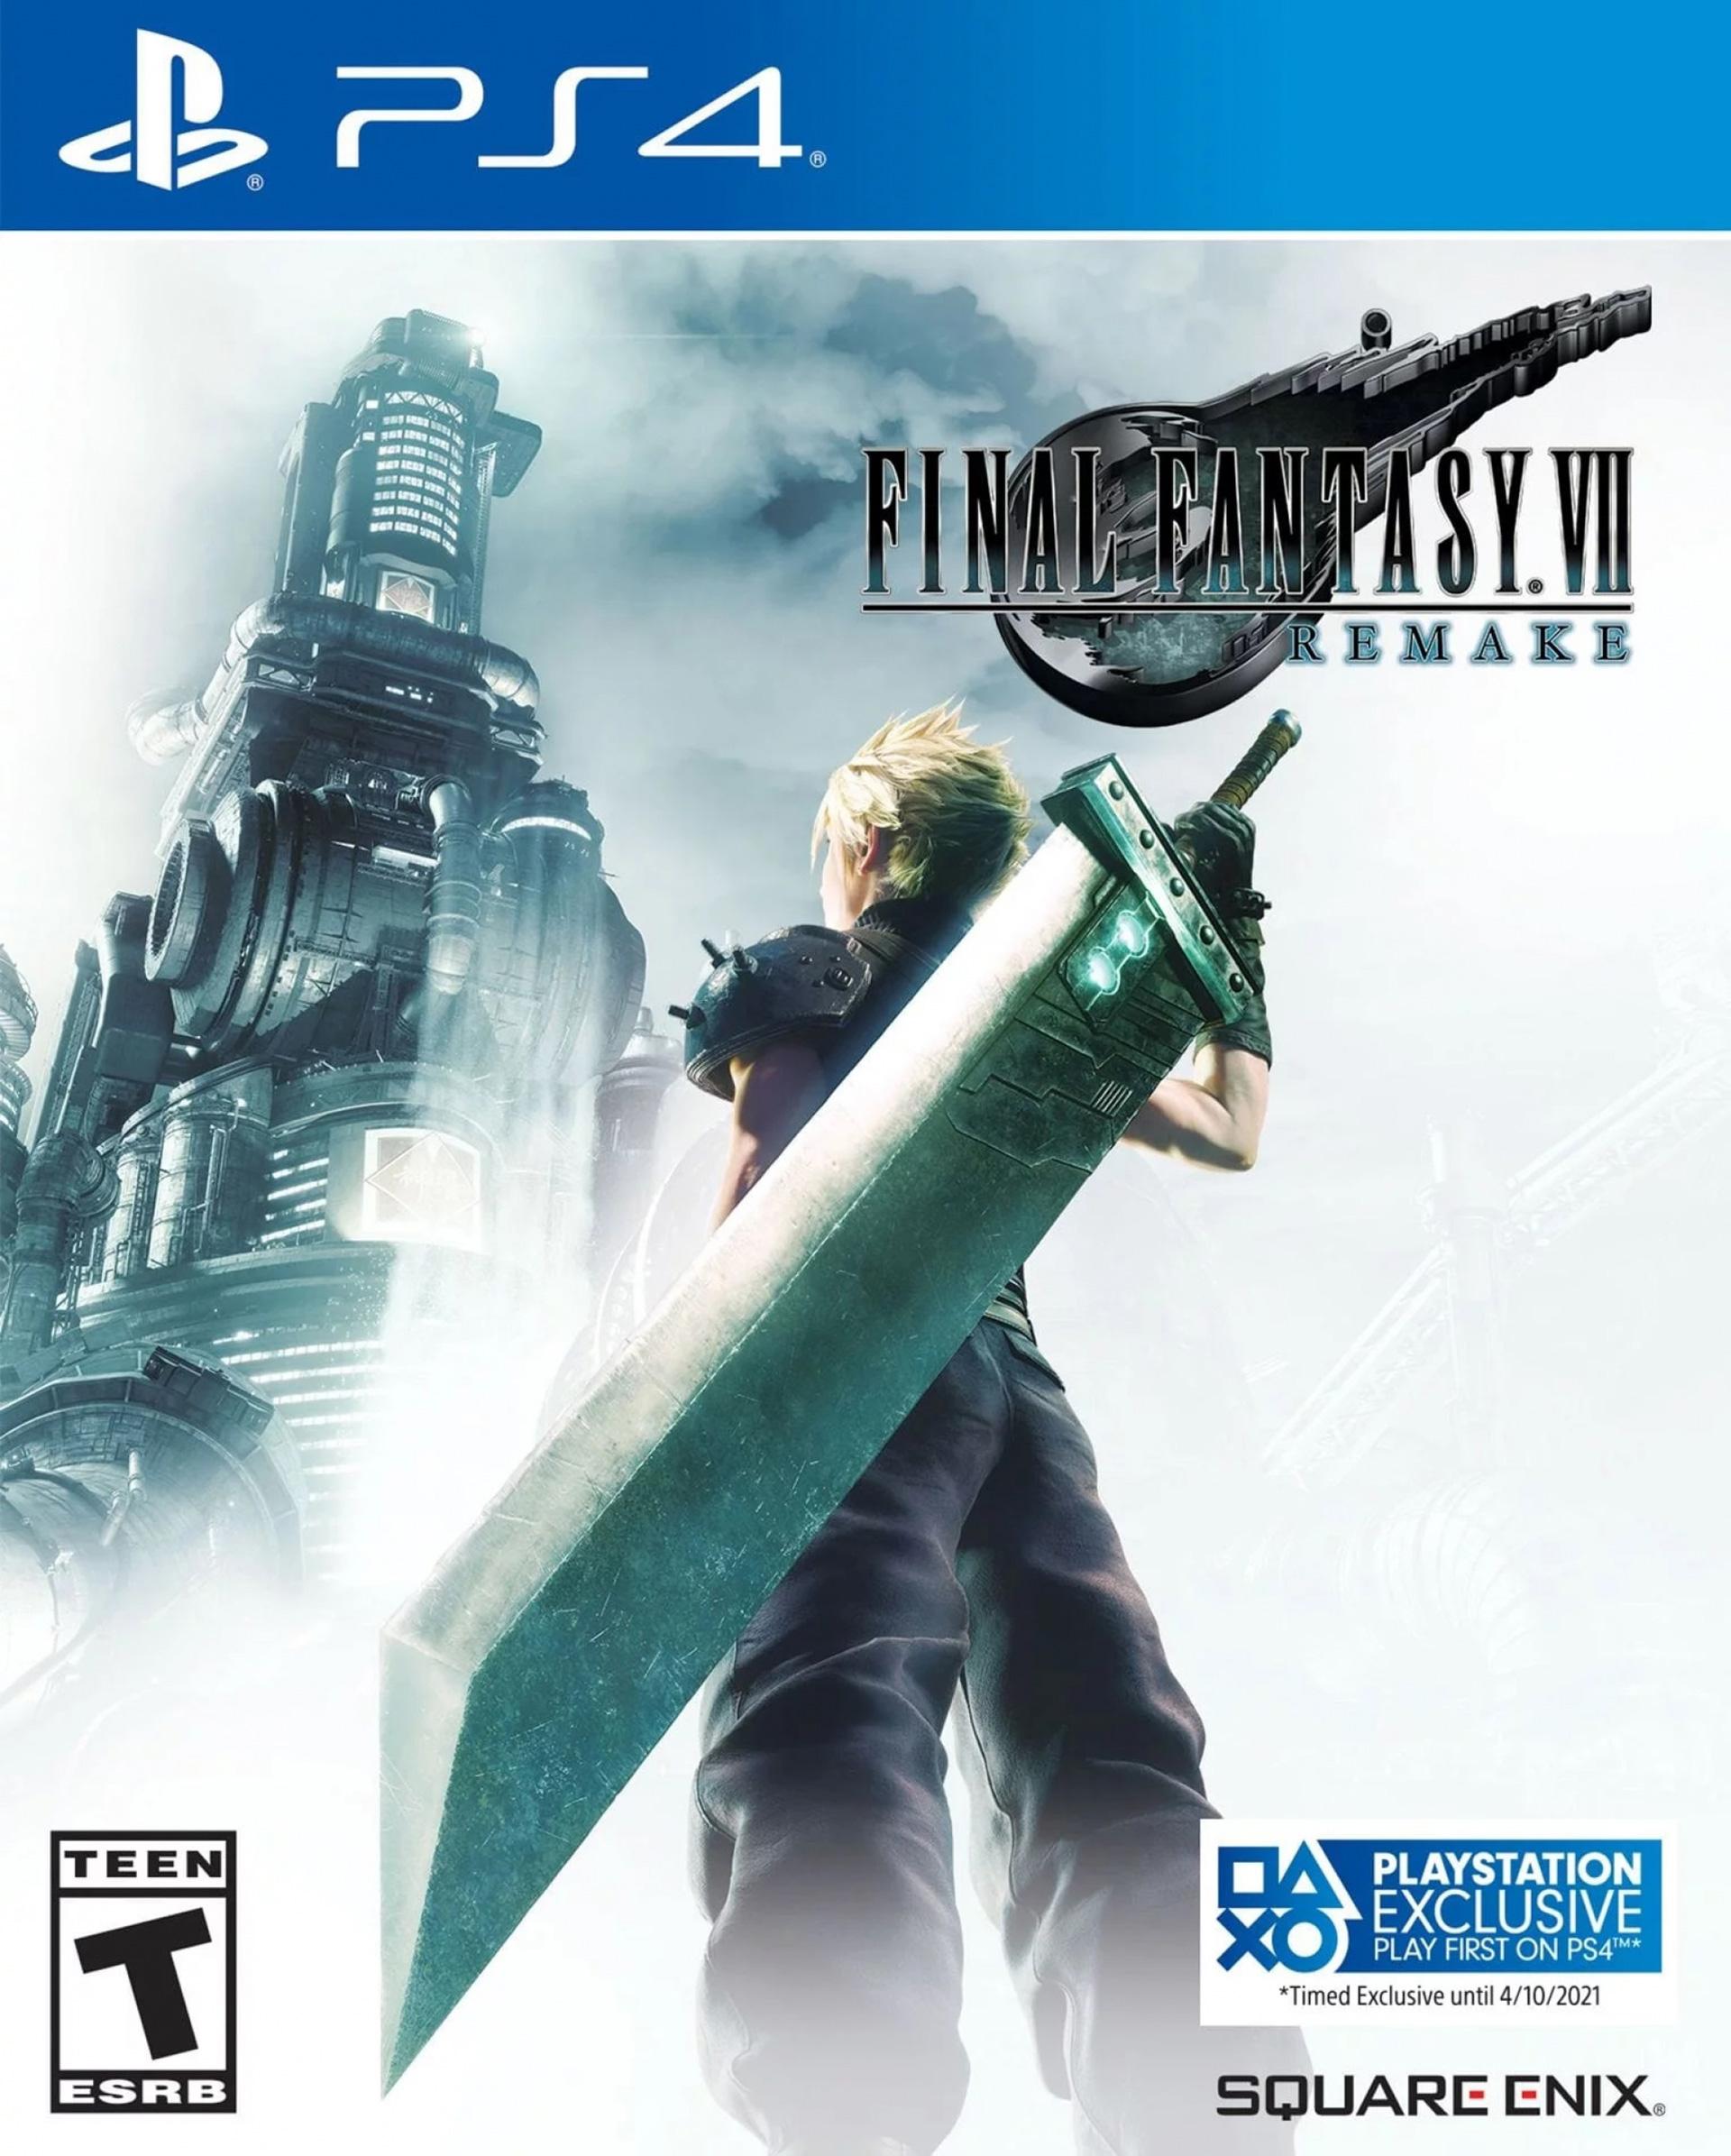 Final Fantasy VII Remake é exclusivo PS4 até Abril de 2021